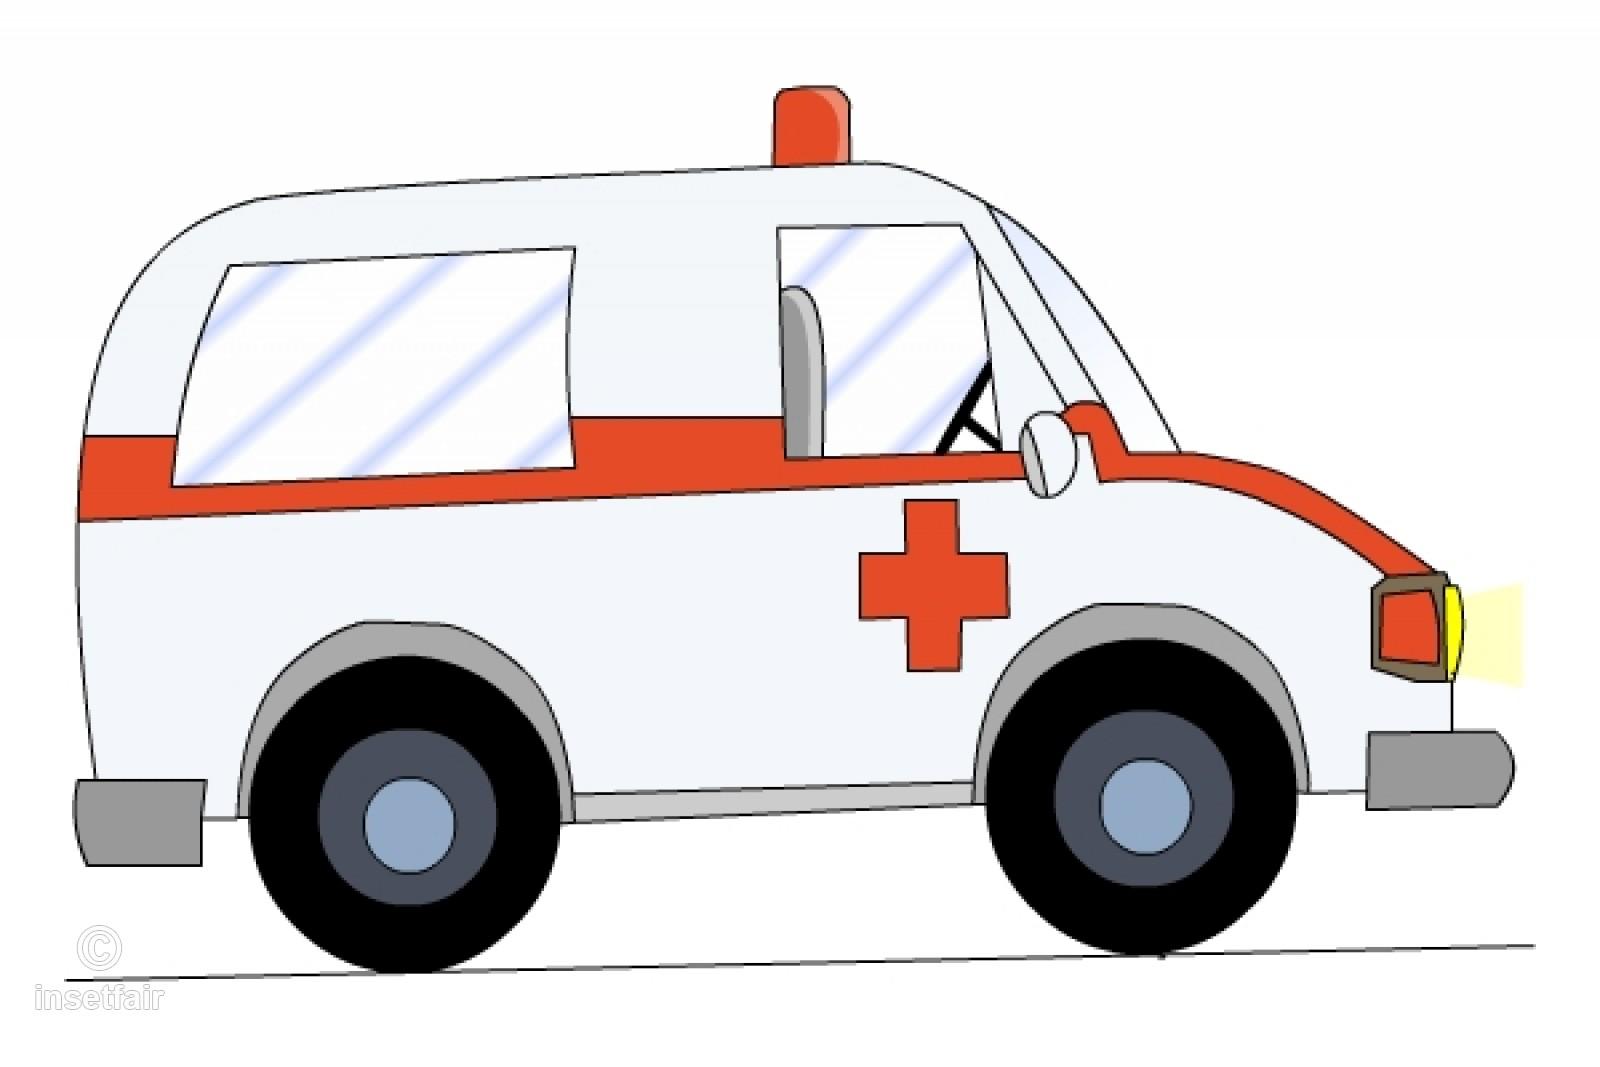 Cartoon ambulance clipart clipart library library Emergency Ambulance vehicle cartoon PNG clipart clipart library library